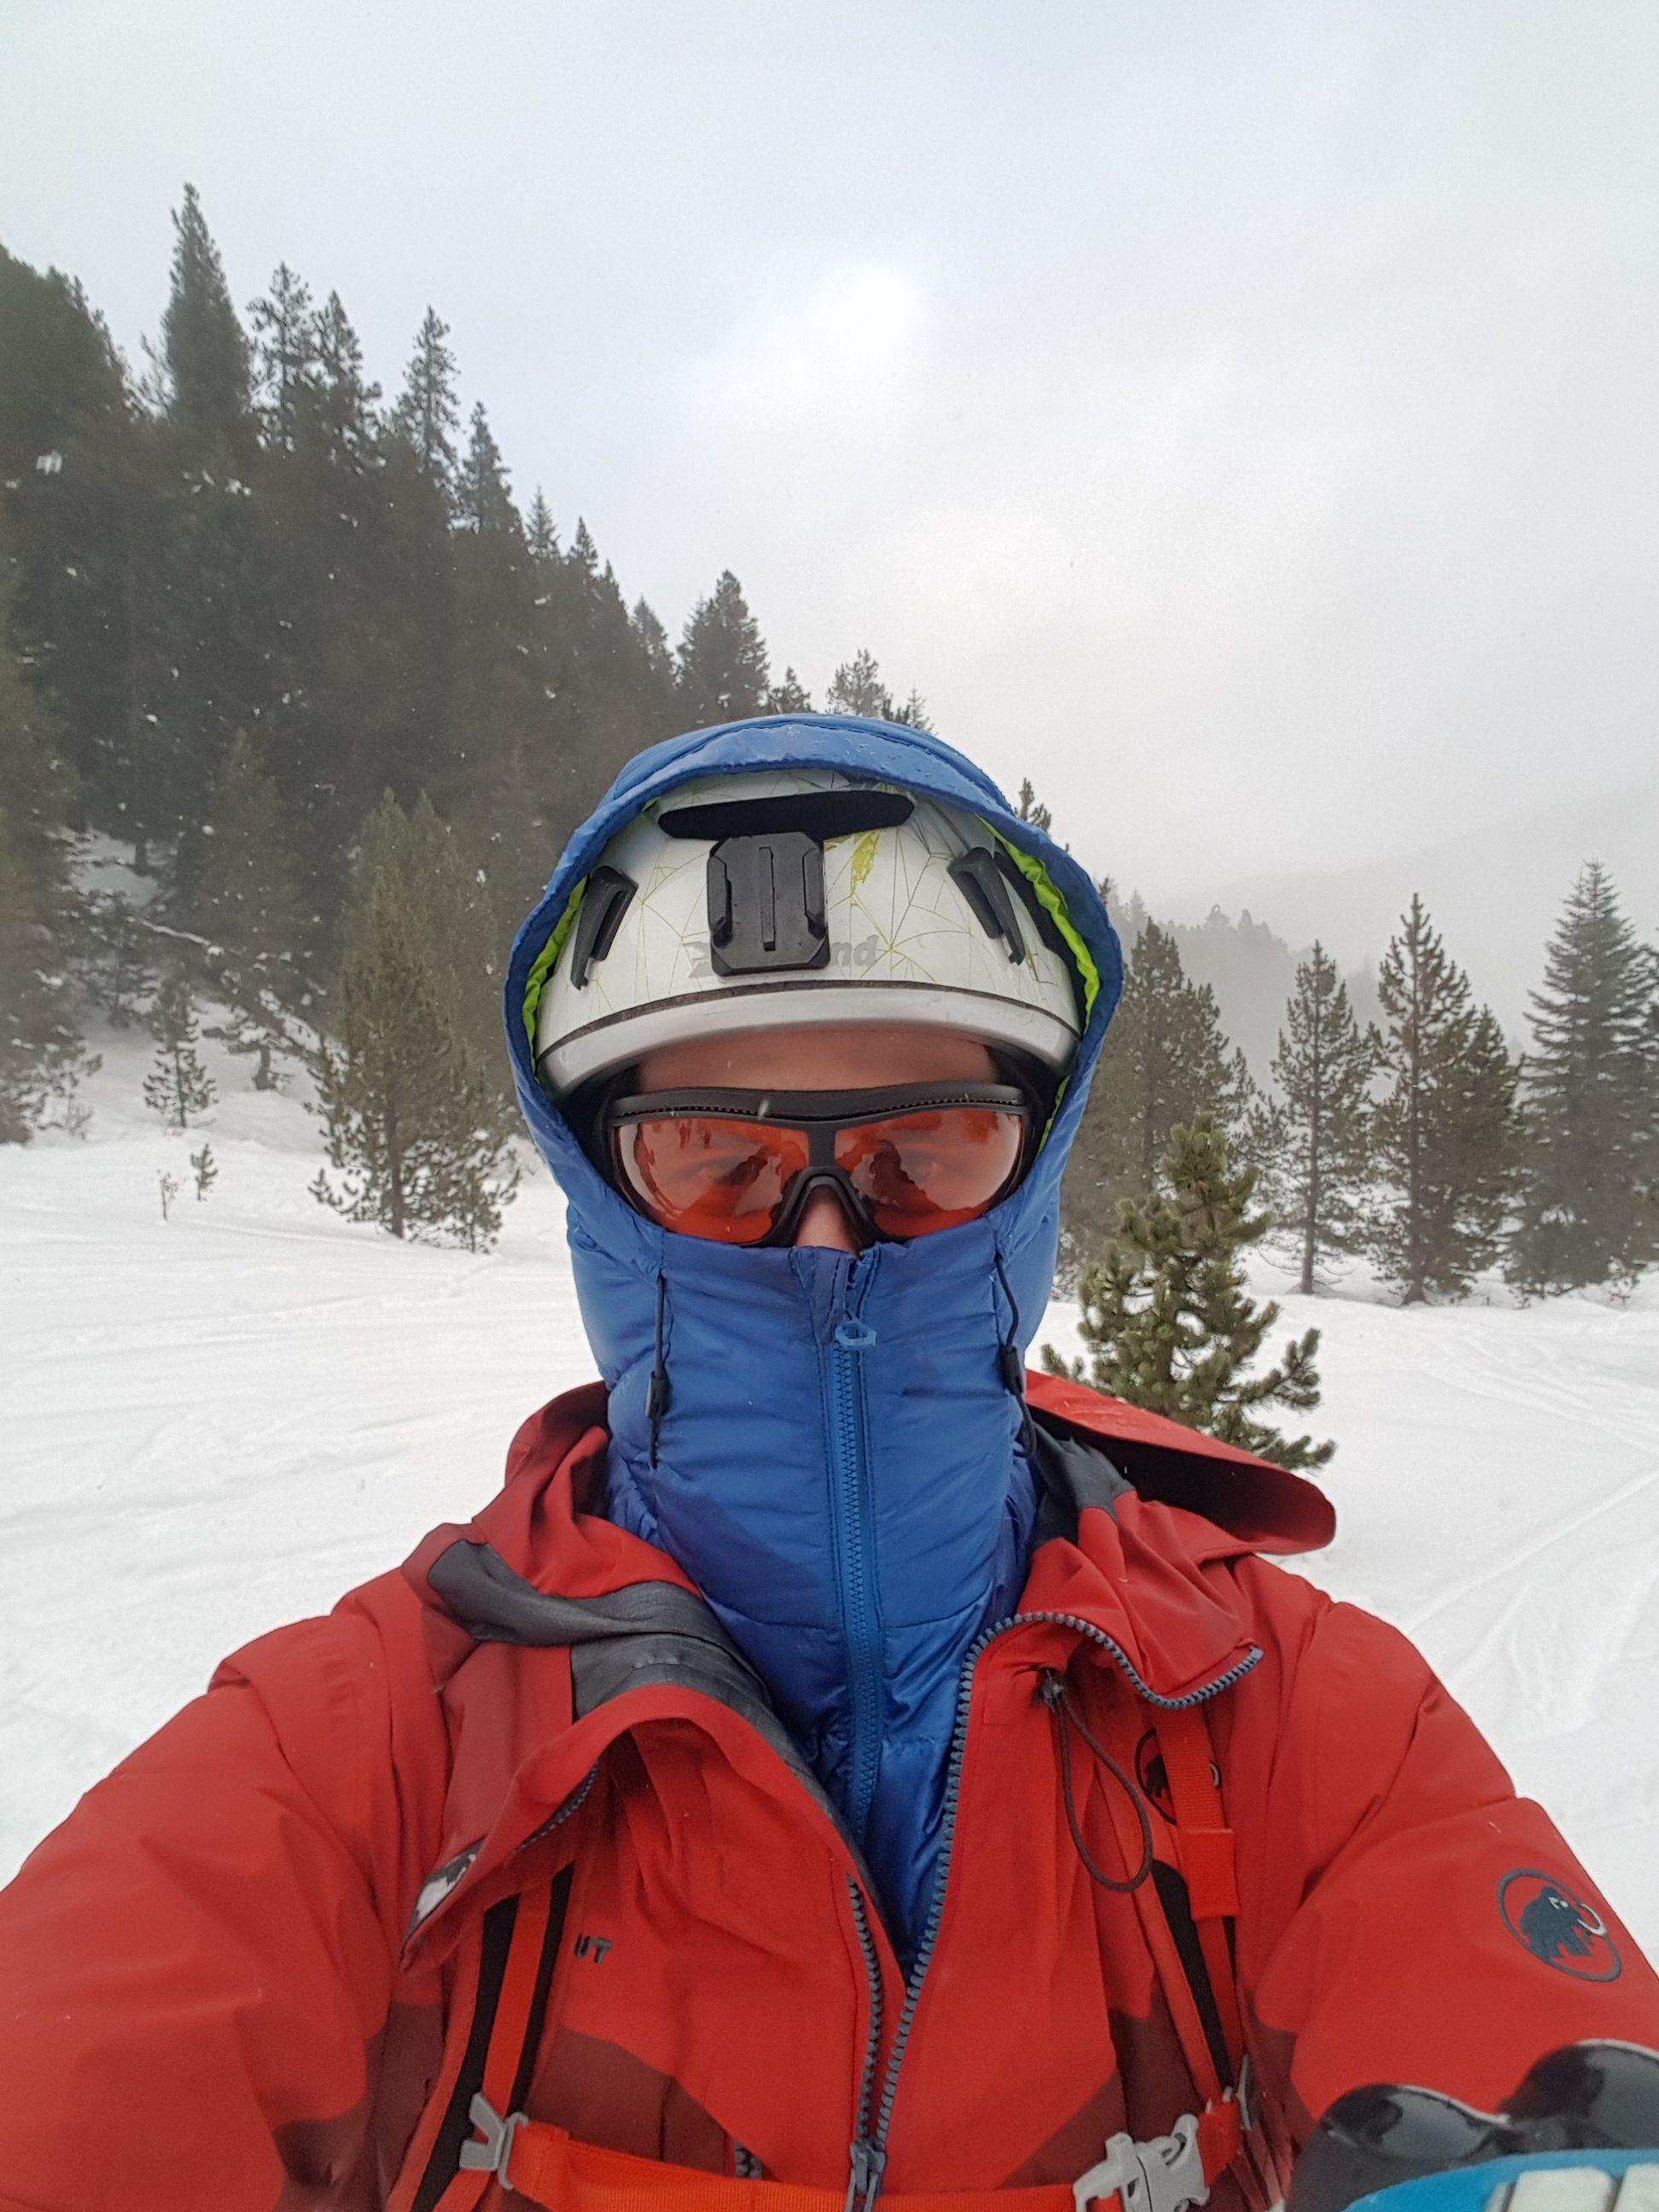 our terrain and ski modalities.